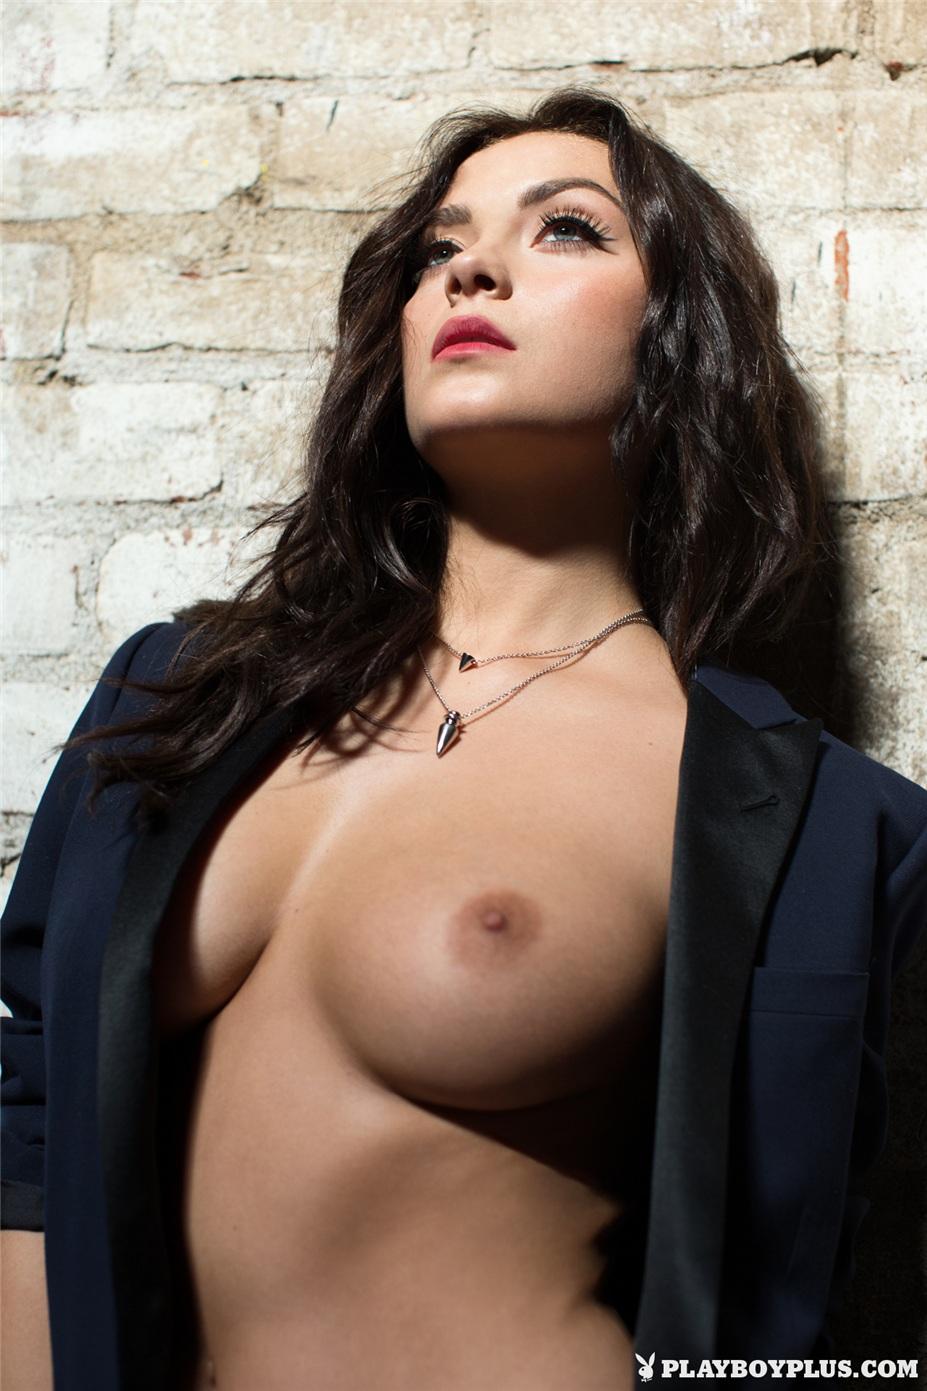 Девушка месяца Александра Тайлер / Alexandra Tyler - Playboy US april 2015 Playmate